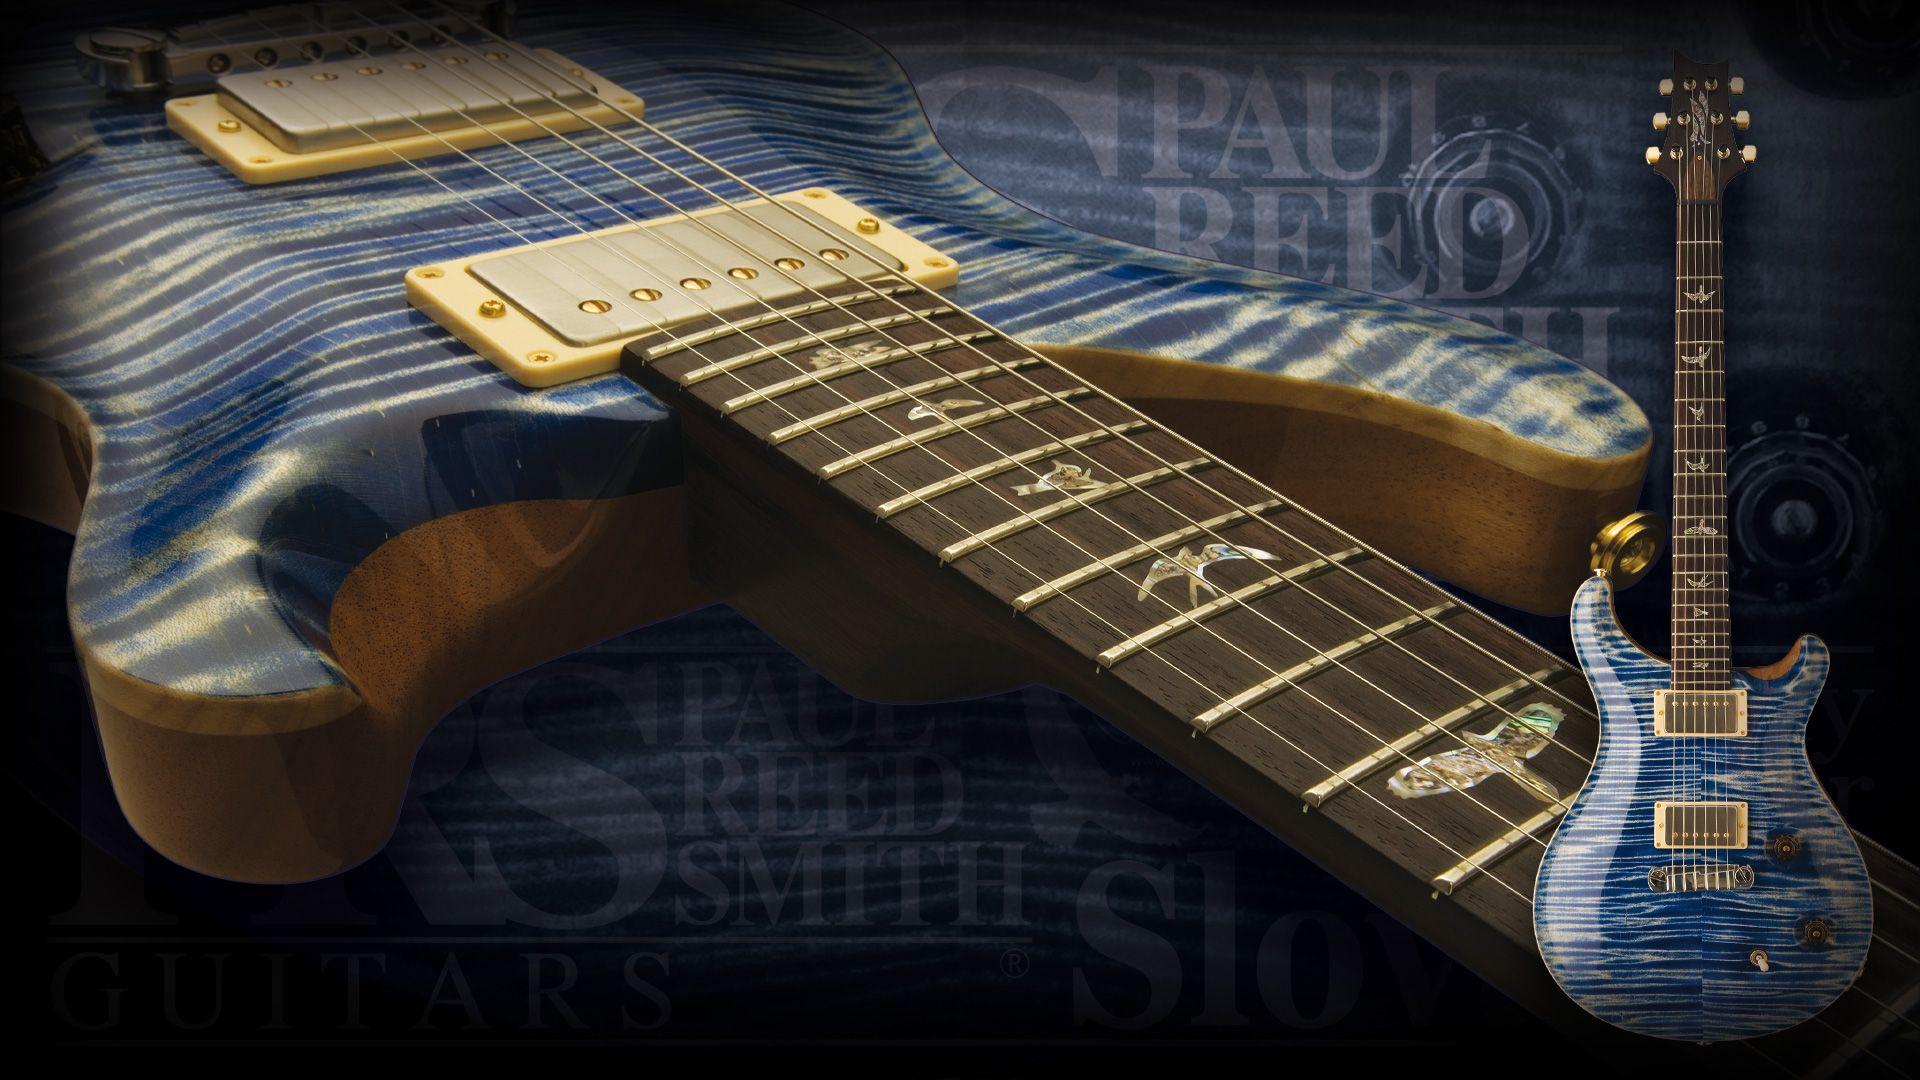 prs guitars wallpapers prs guitars pinterest prs guitar